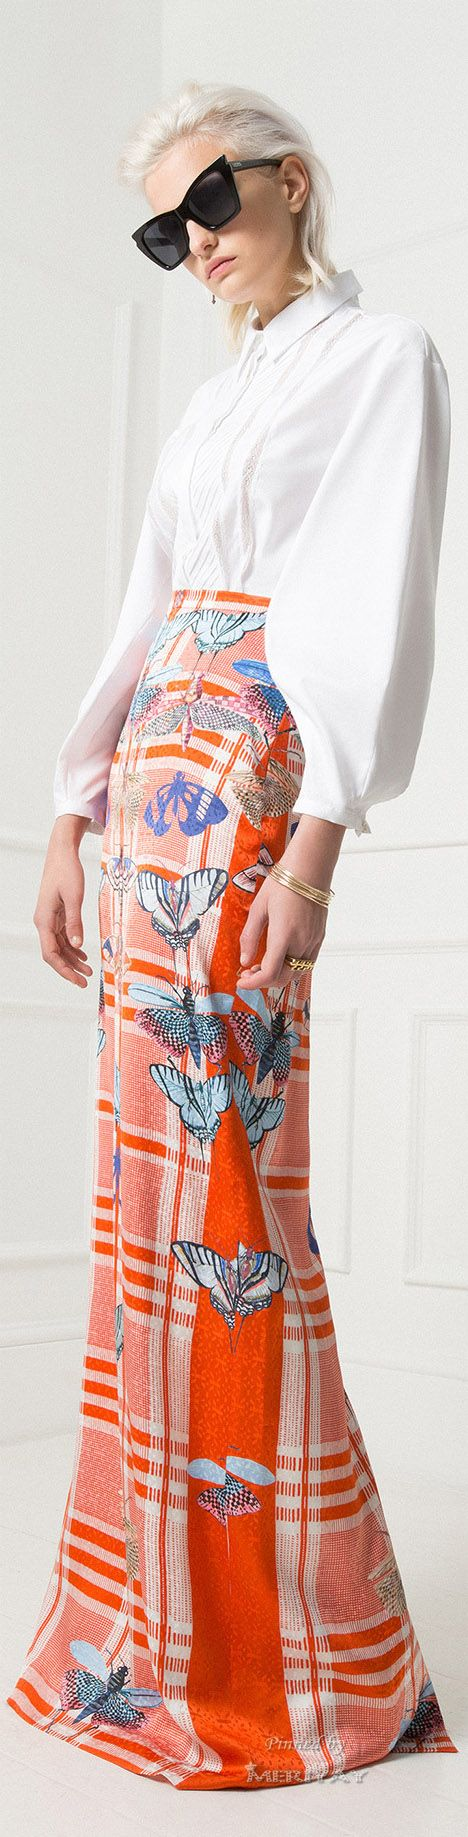 Color fashion Glam                                        Temperley London Resort 2015.